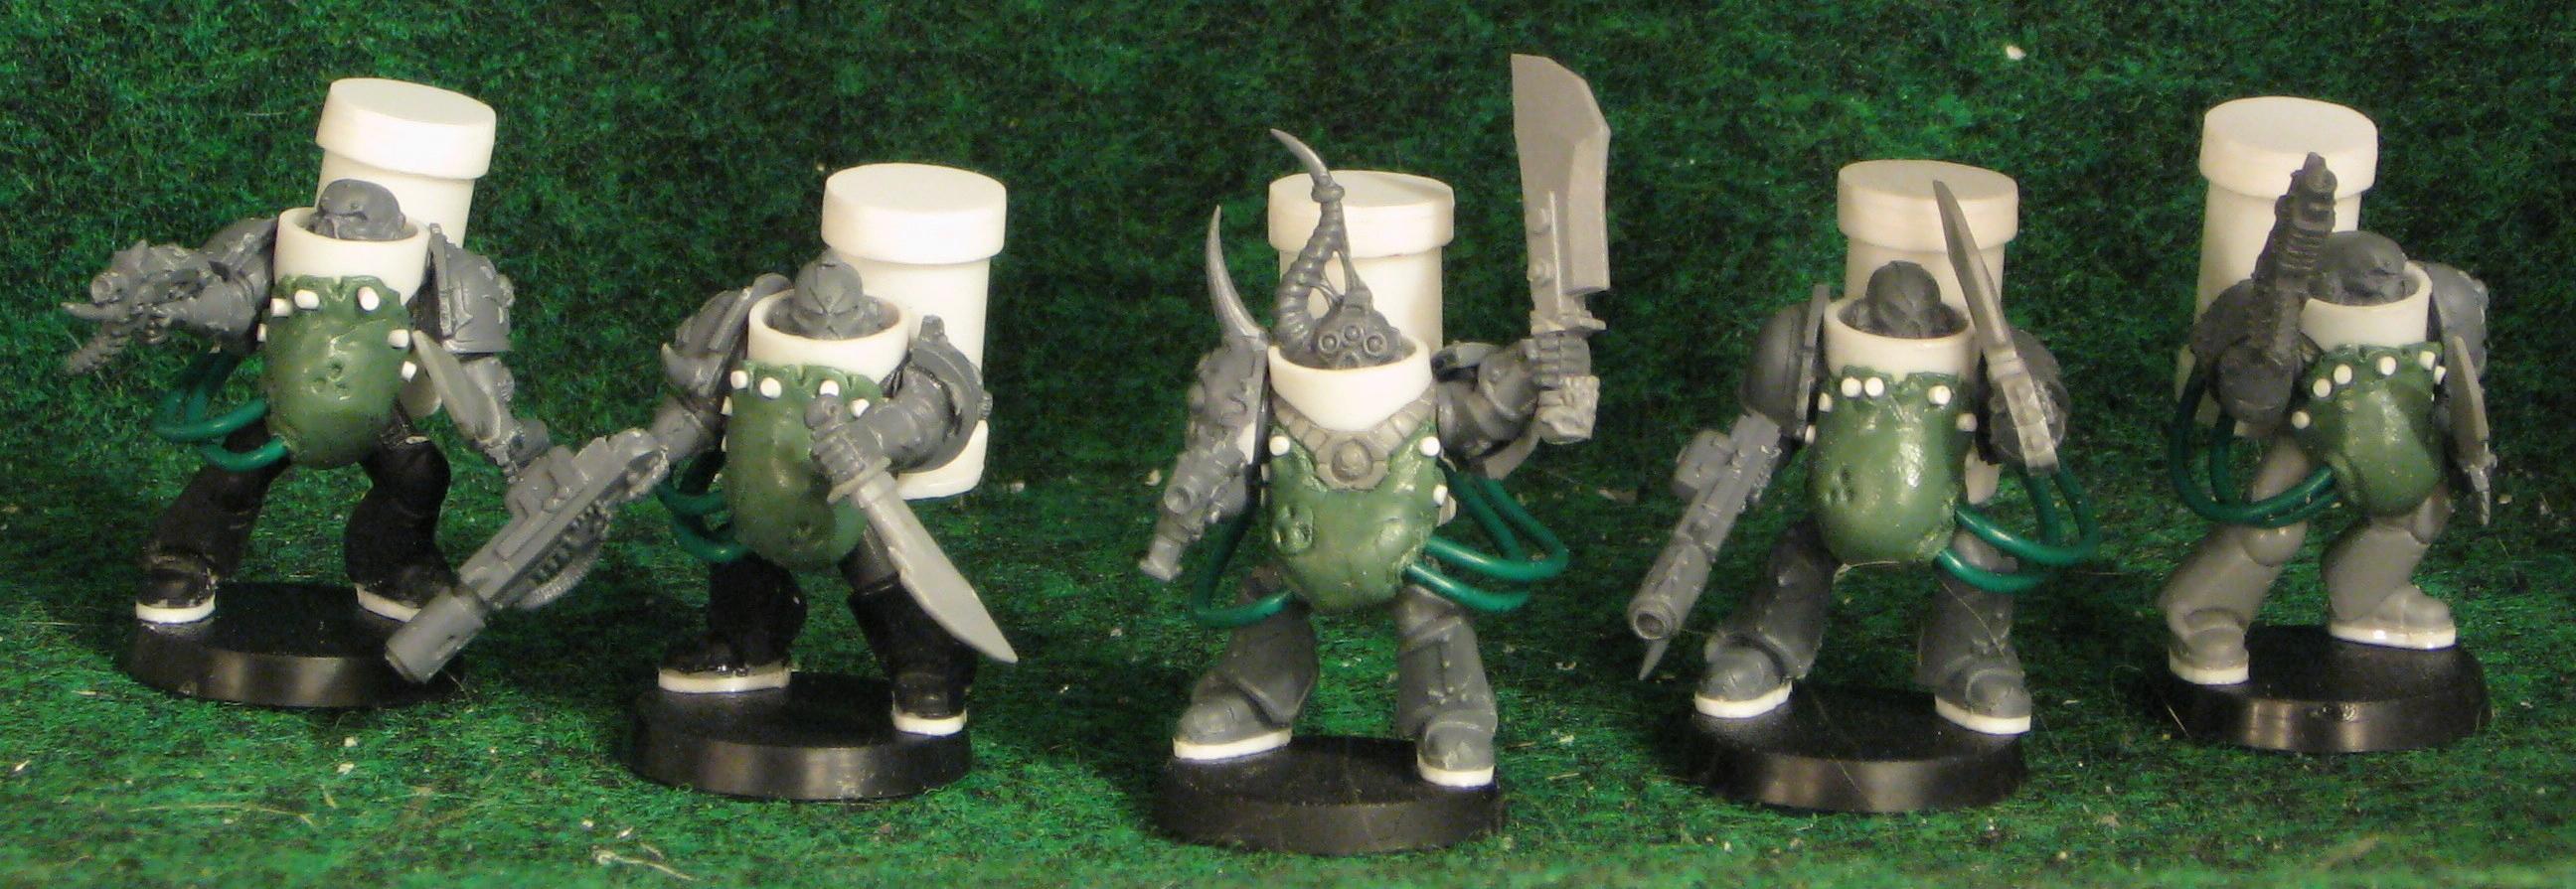 Chaos Space Marines, Death Guard, Nurgle, Plague Marines